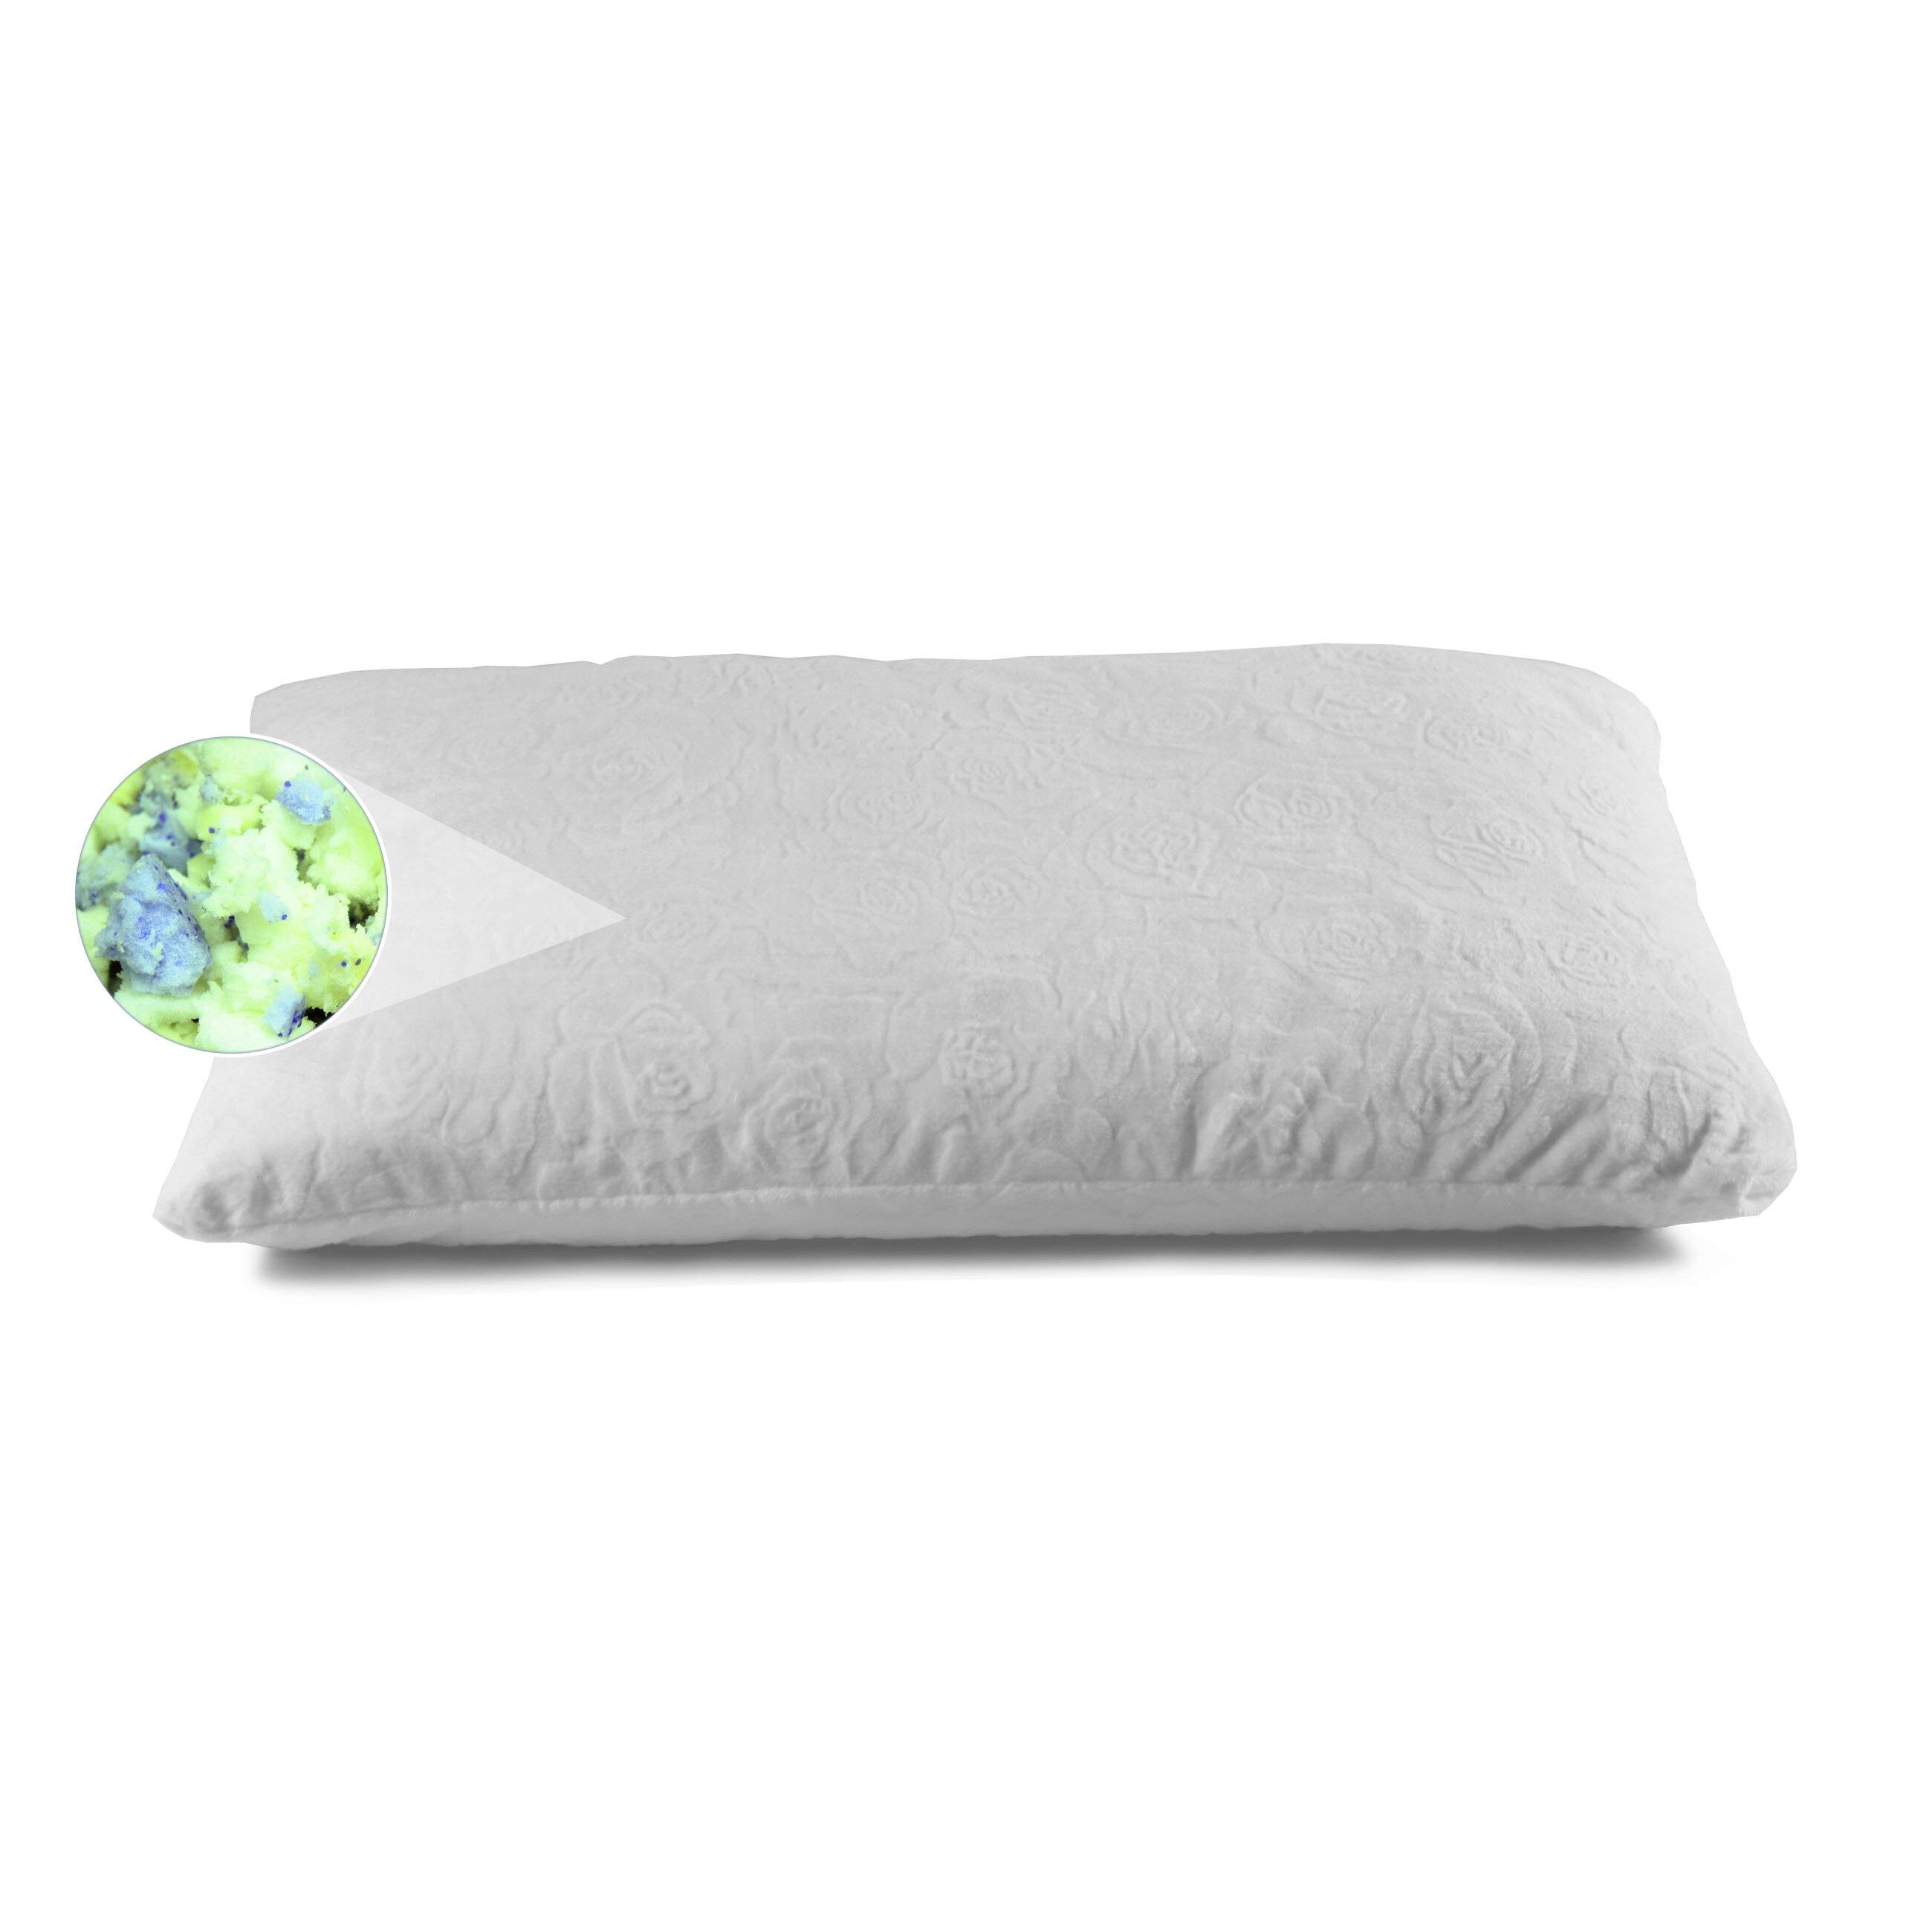 Brooklyn bedding ultimate dreams shredded gel memory foam for Bed pillows reviews